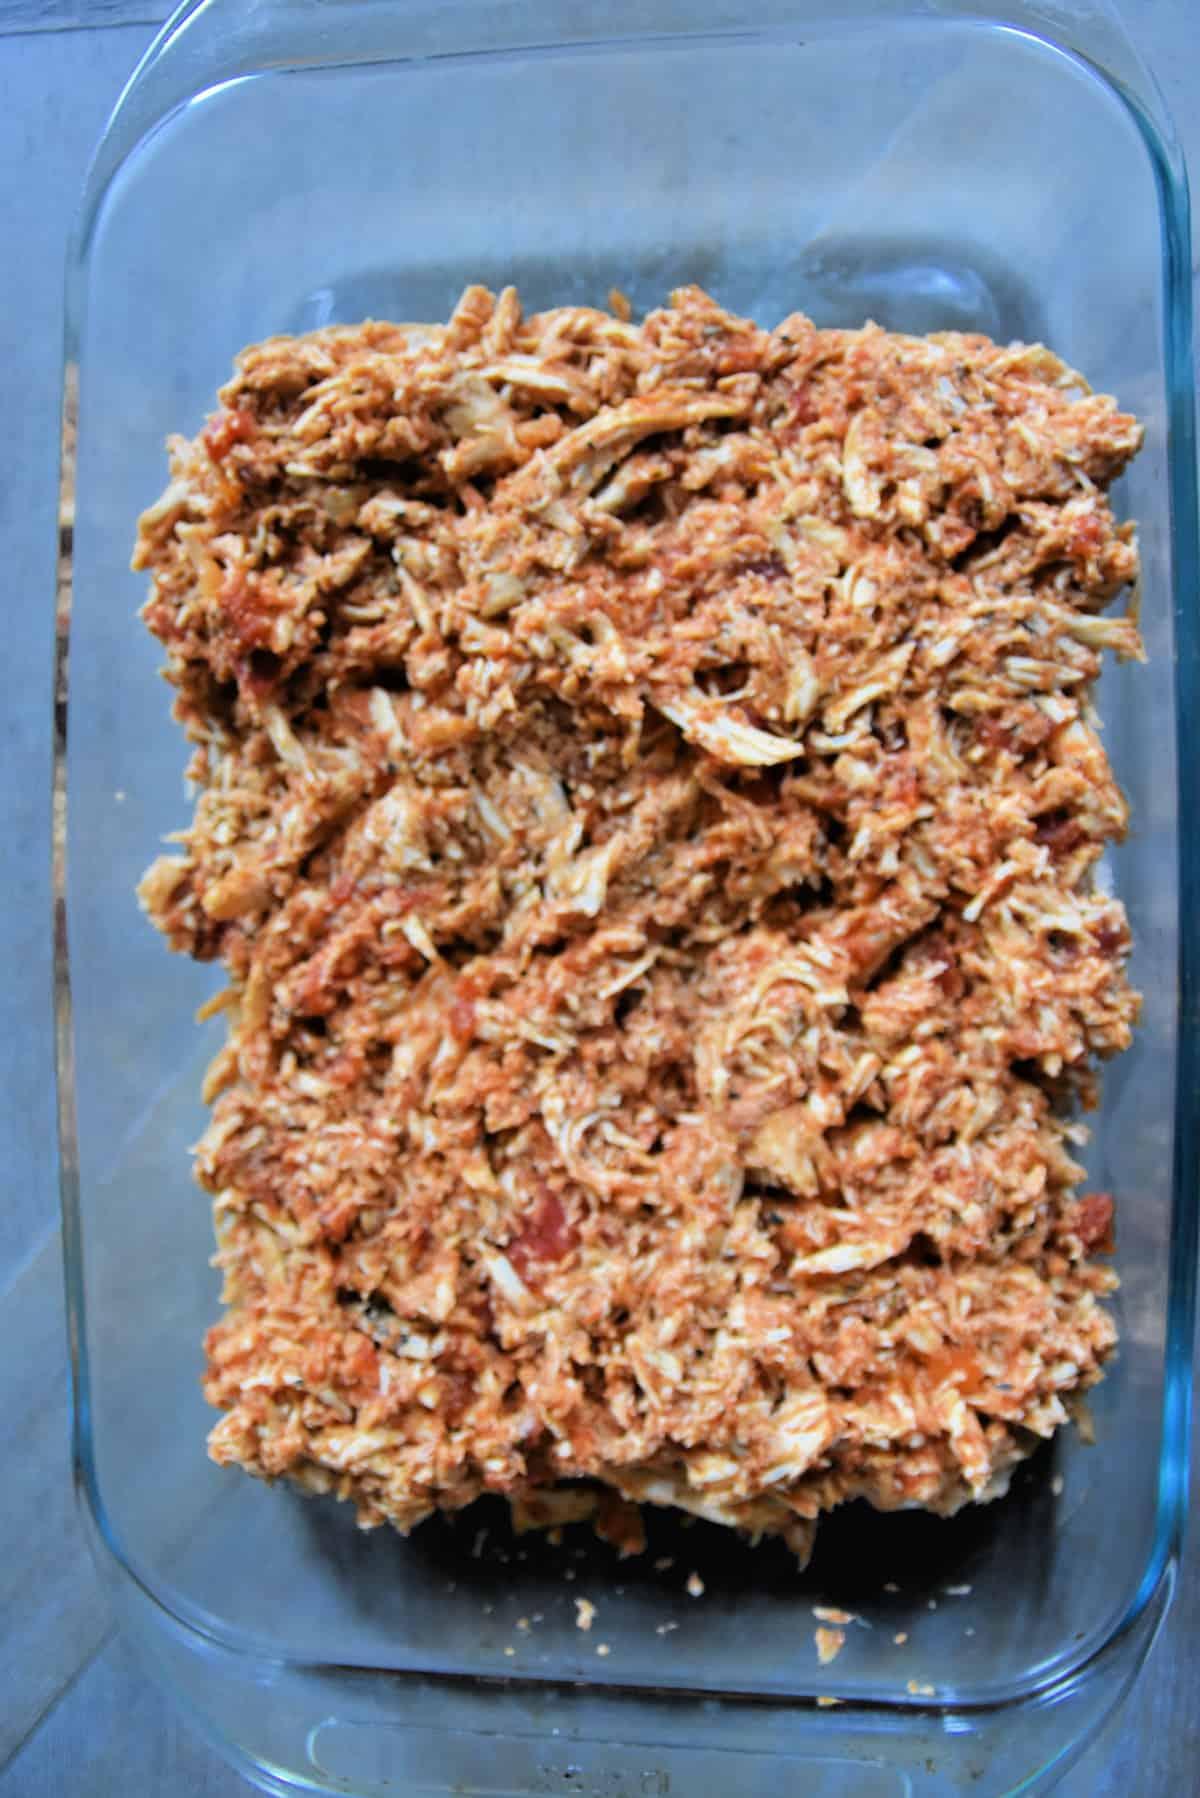 shredded chicken on slider buns